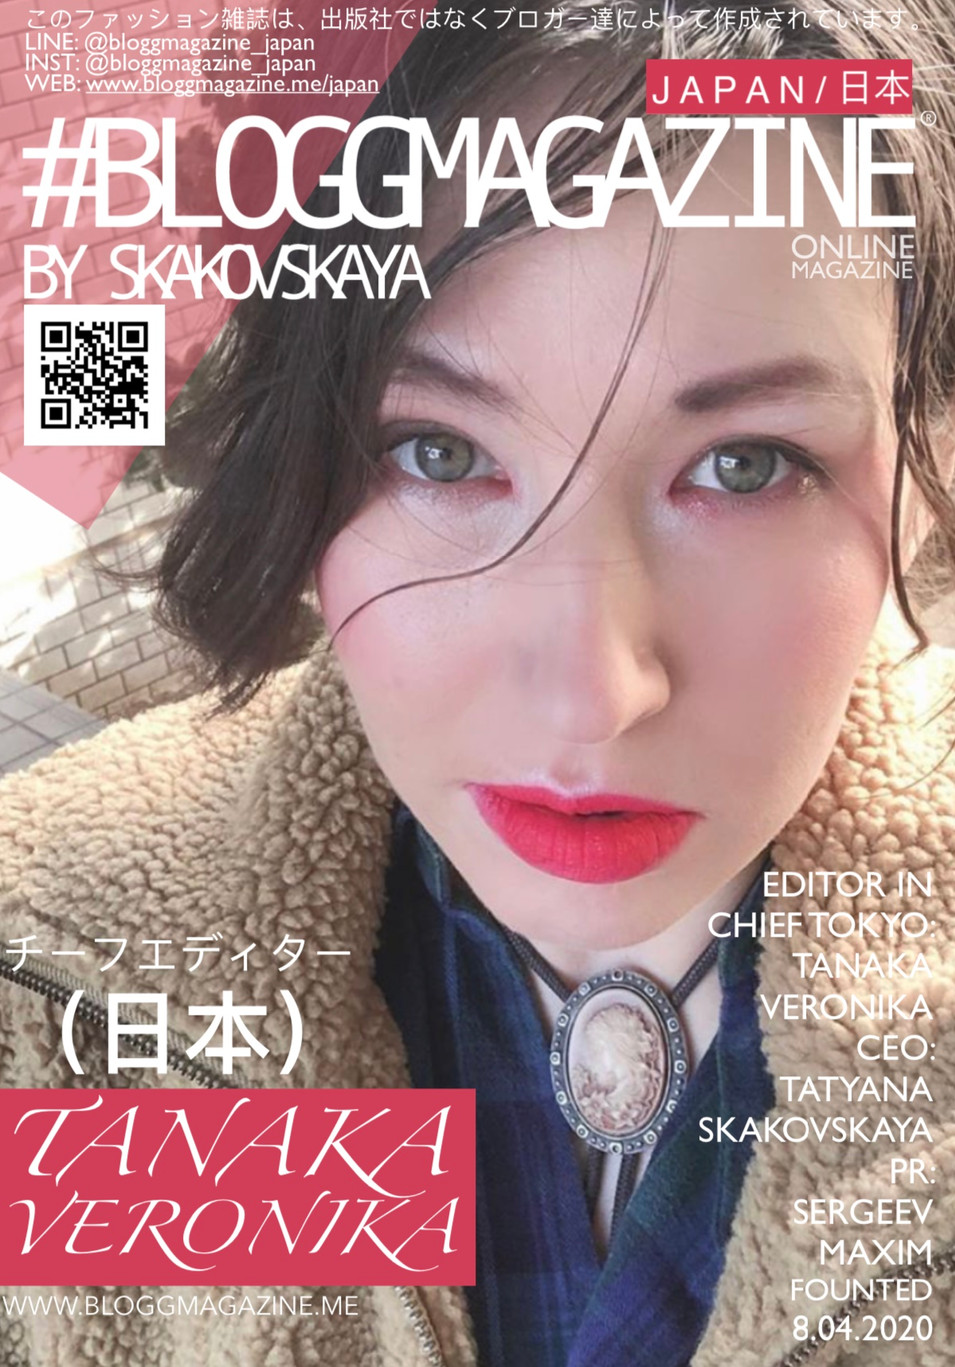 bloggmagazine_japan_tanaka2020.jpeg